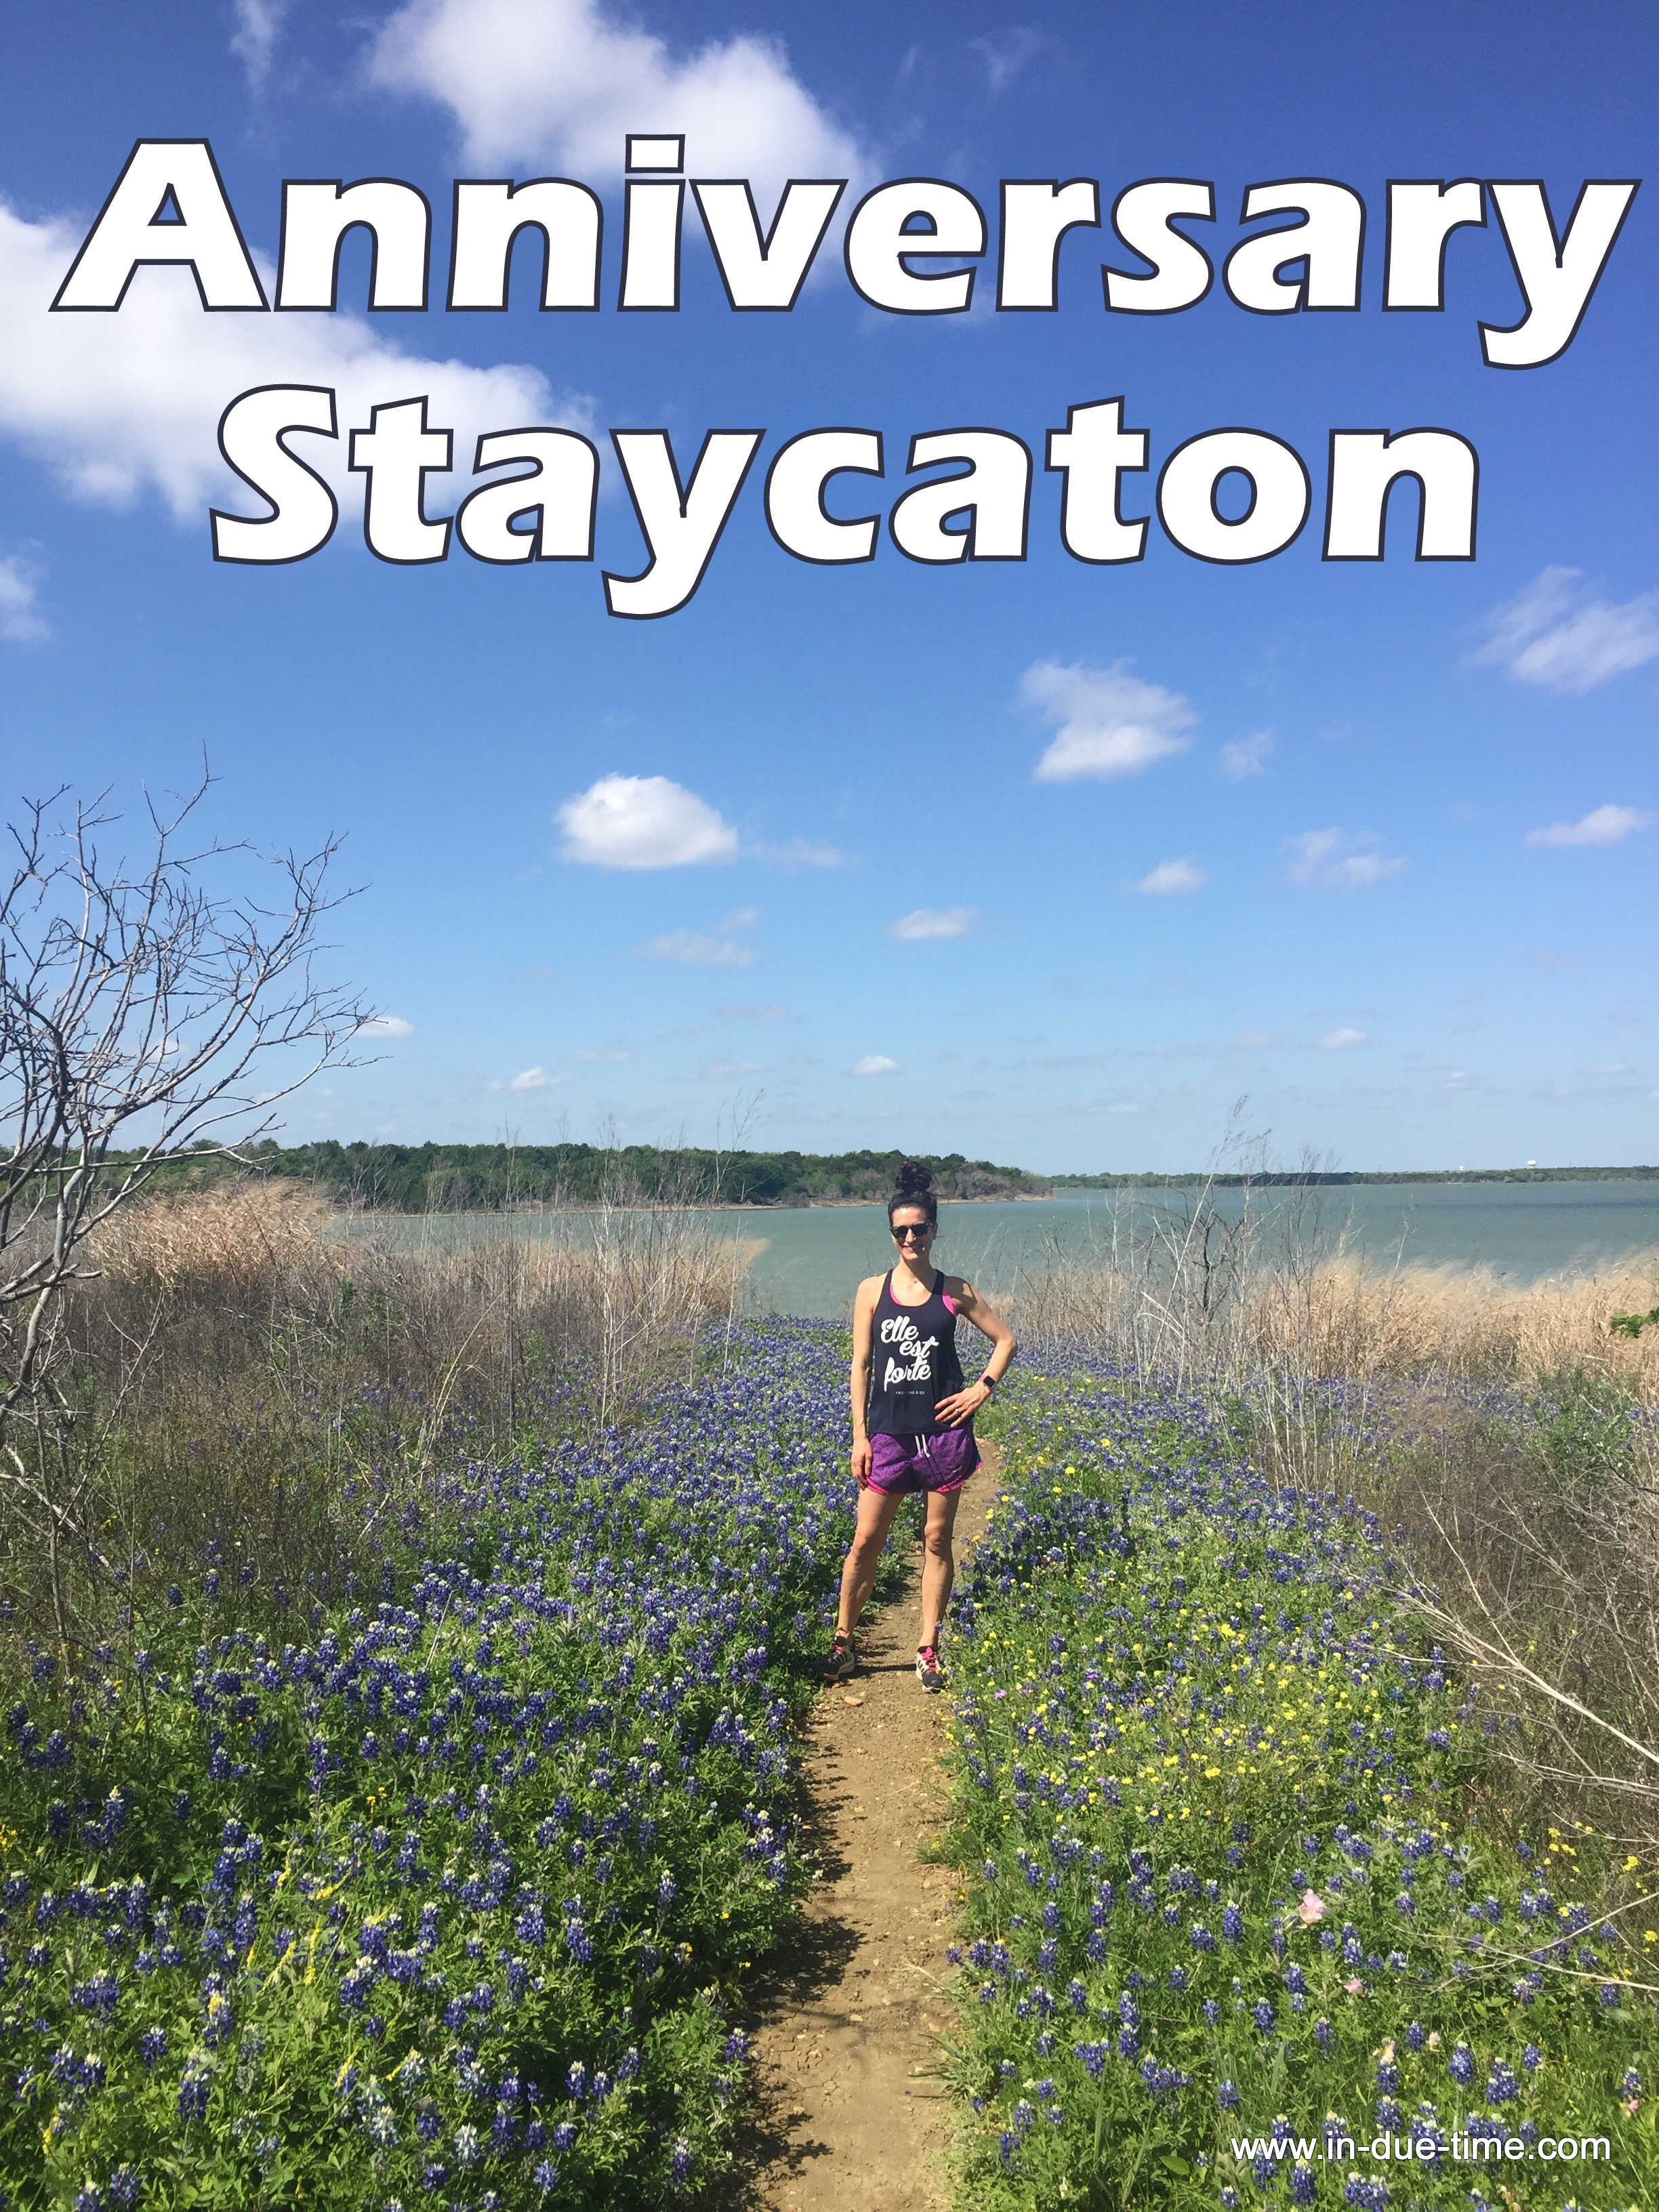 Anniversary Staycation